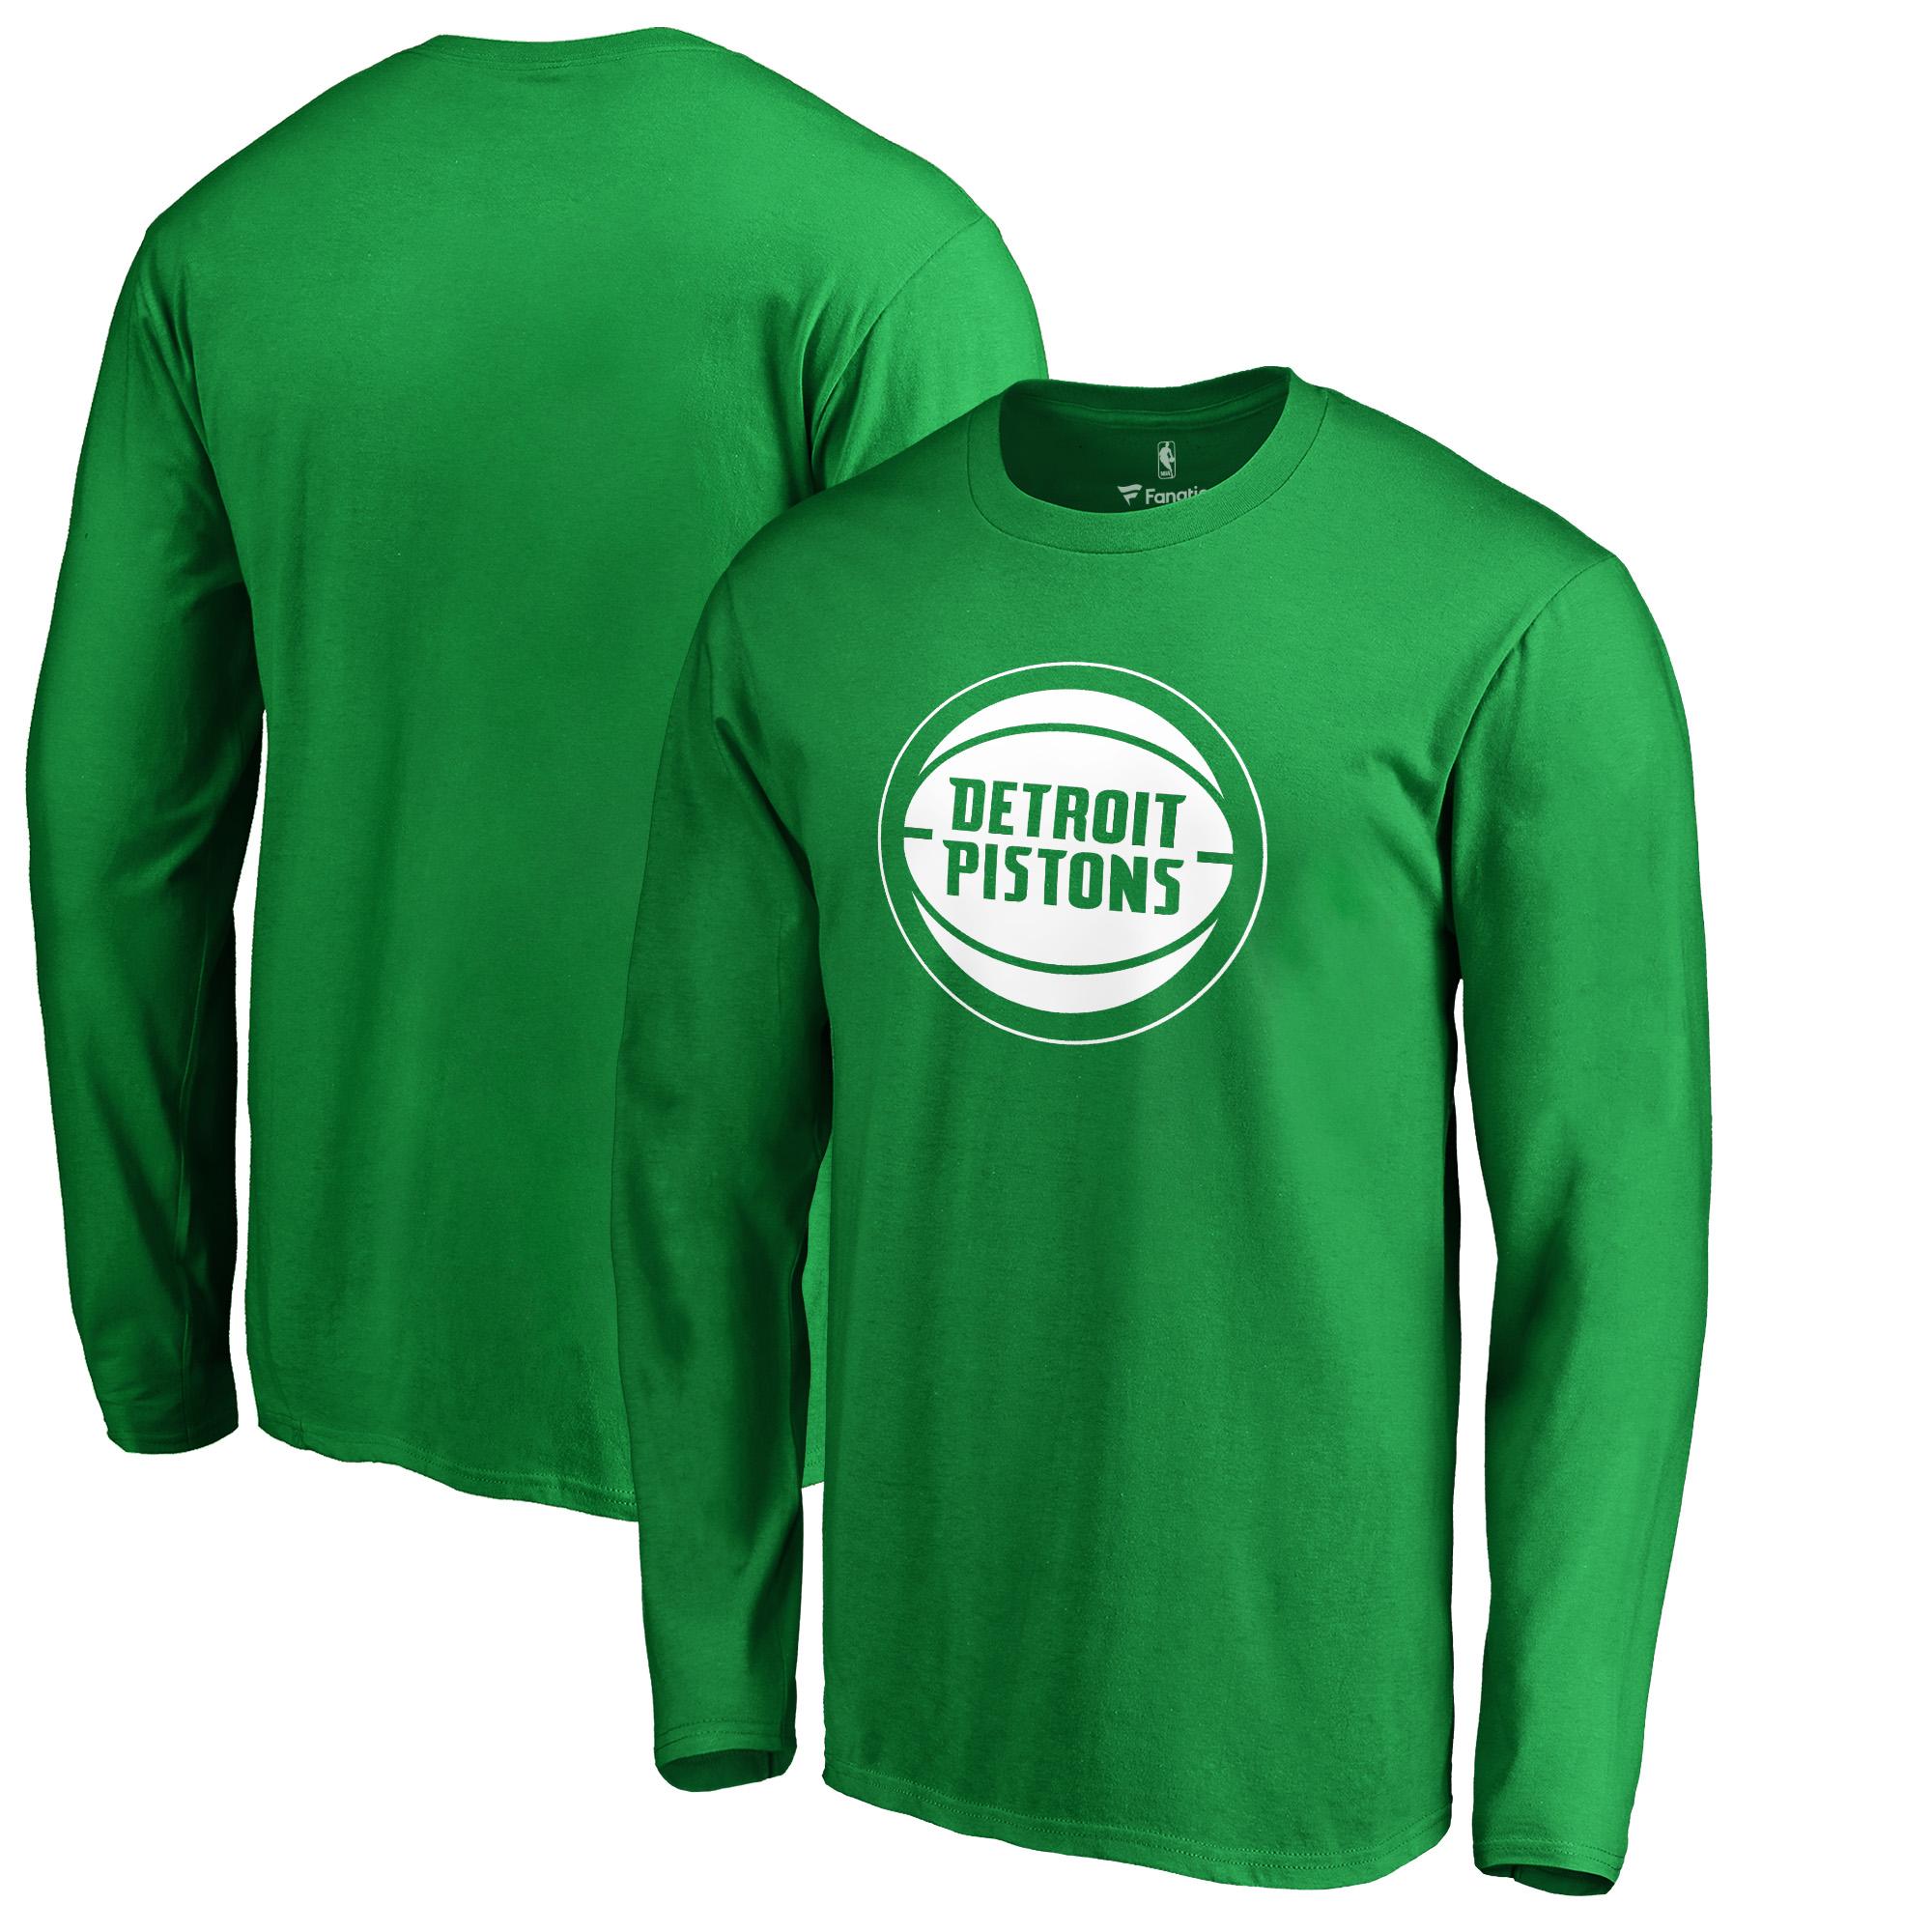 Detroit Pistons Fanatics Branded St. Patrick's Day White Logo Long Sleeve T-Shirt - Kelly Green